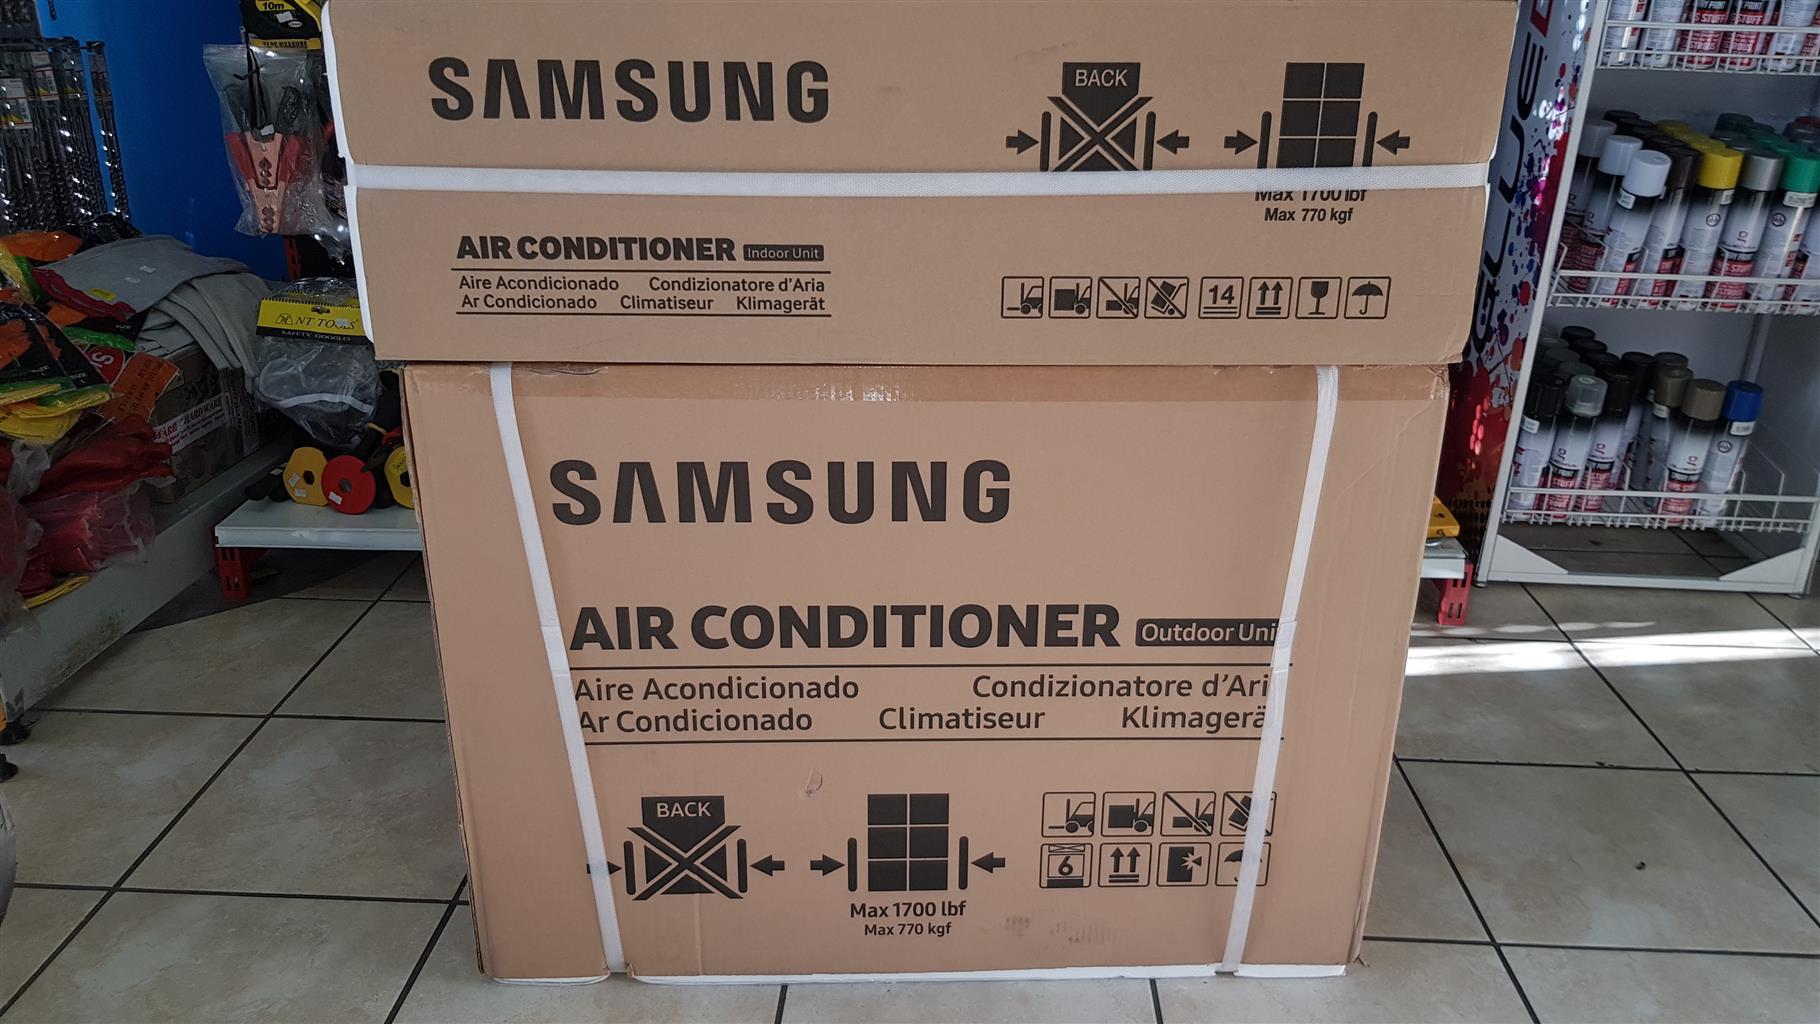 Samsung invertor 12000 btu aircon brand new